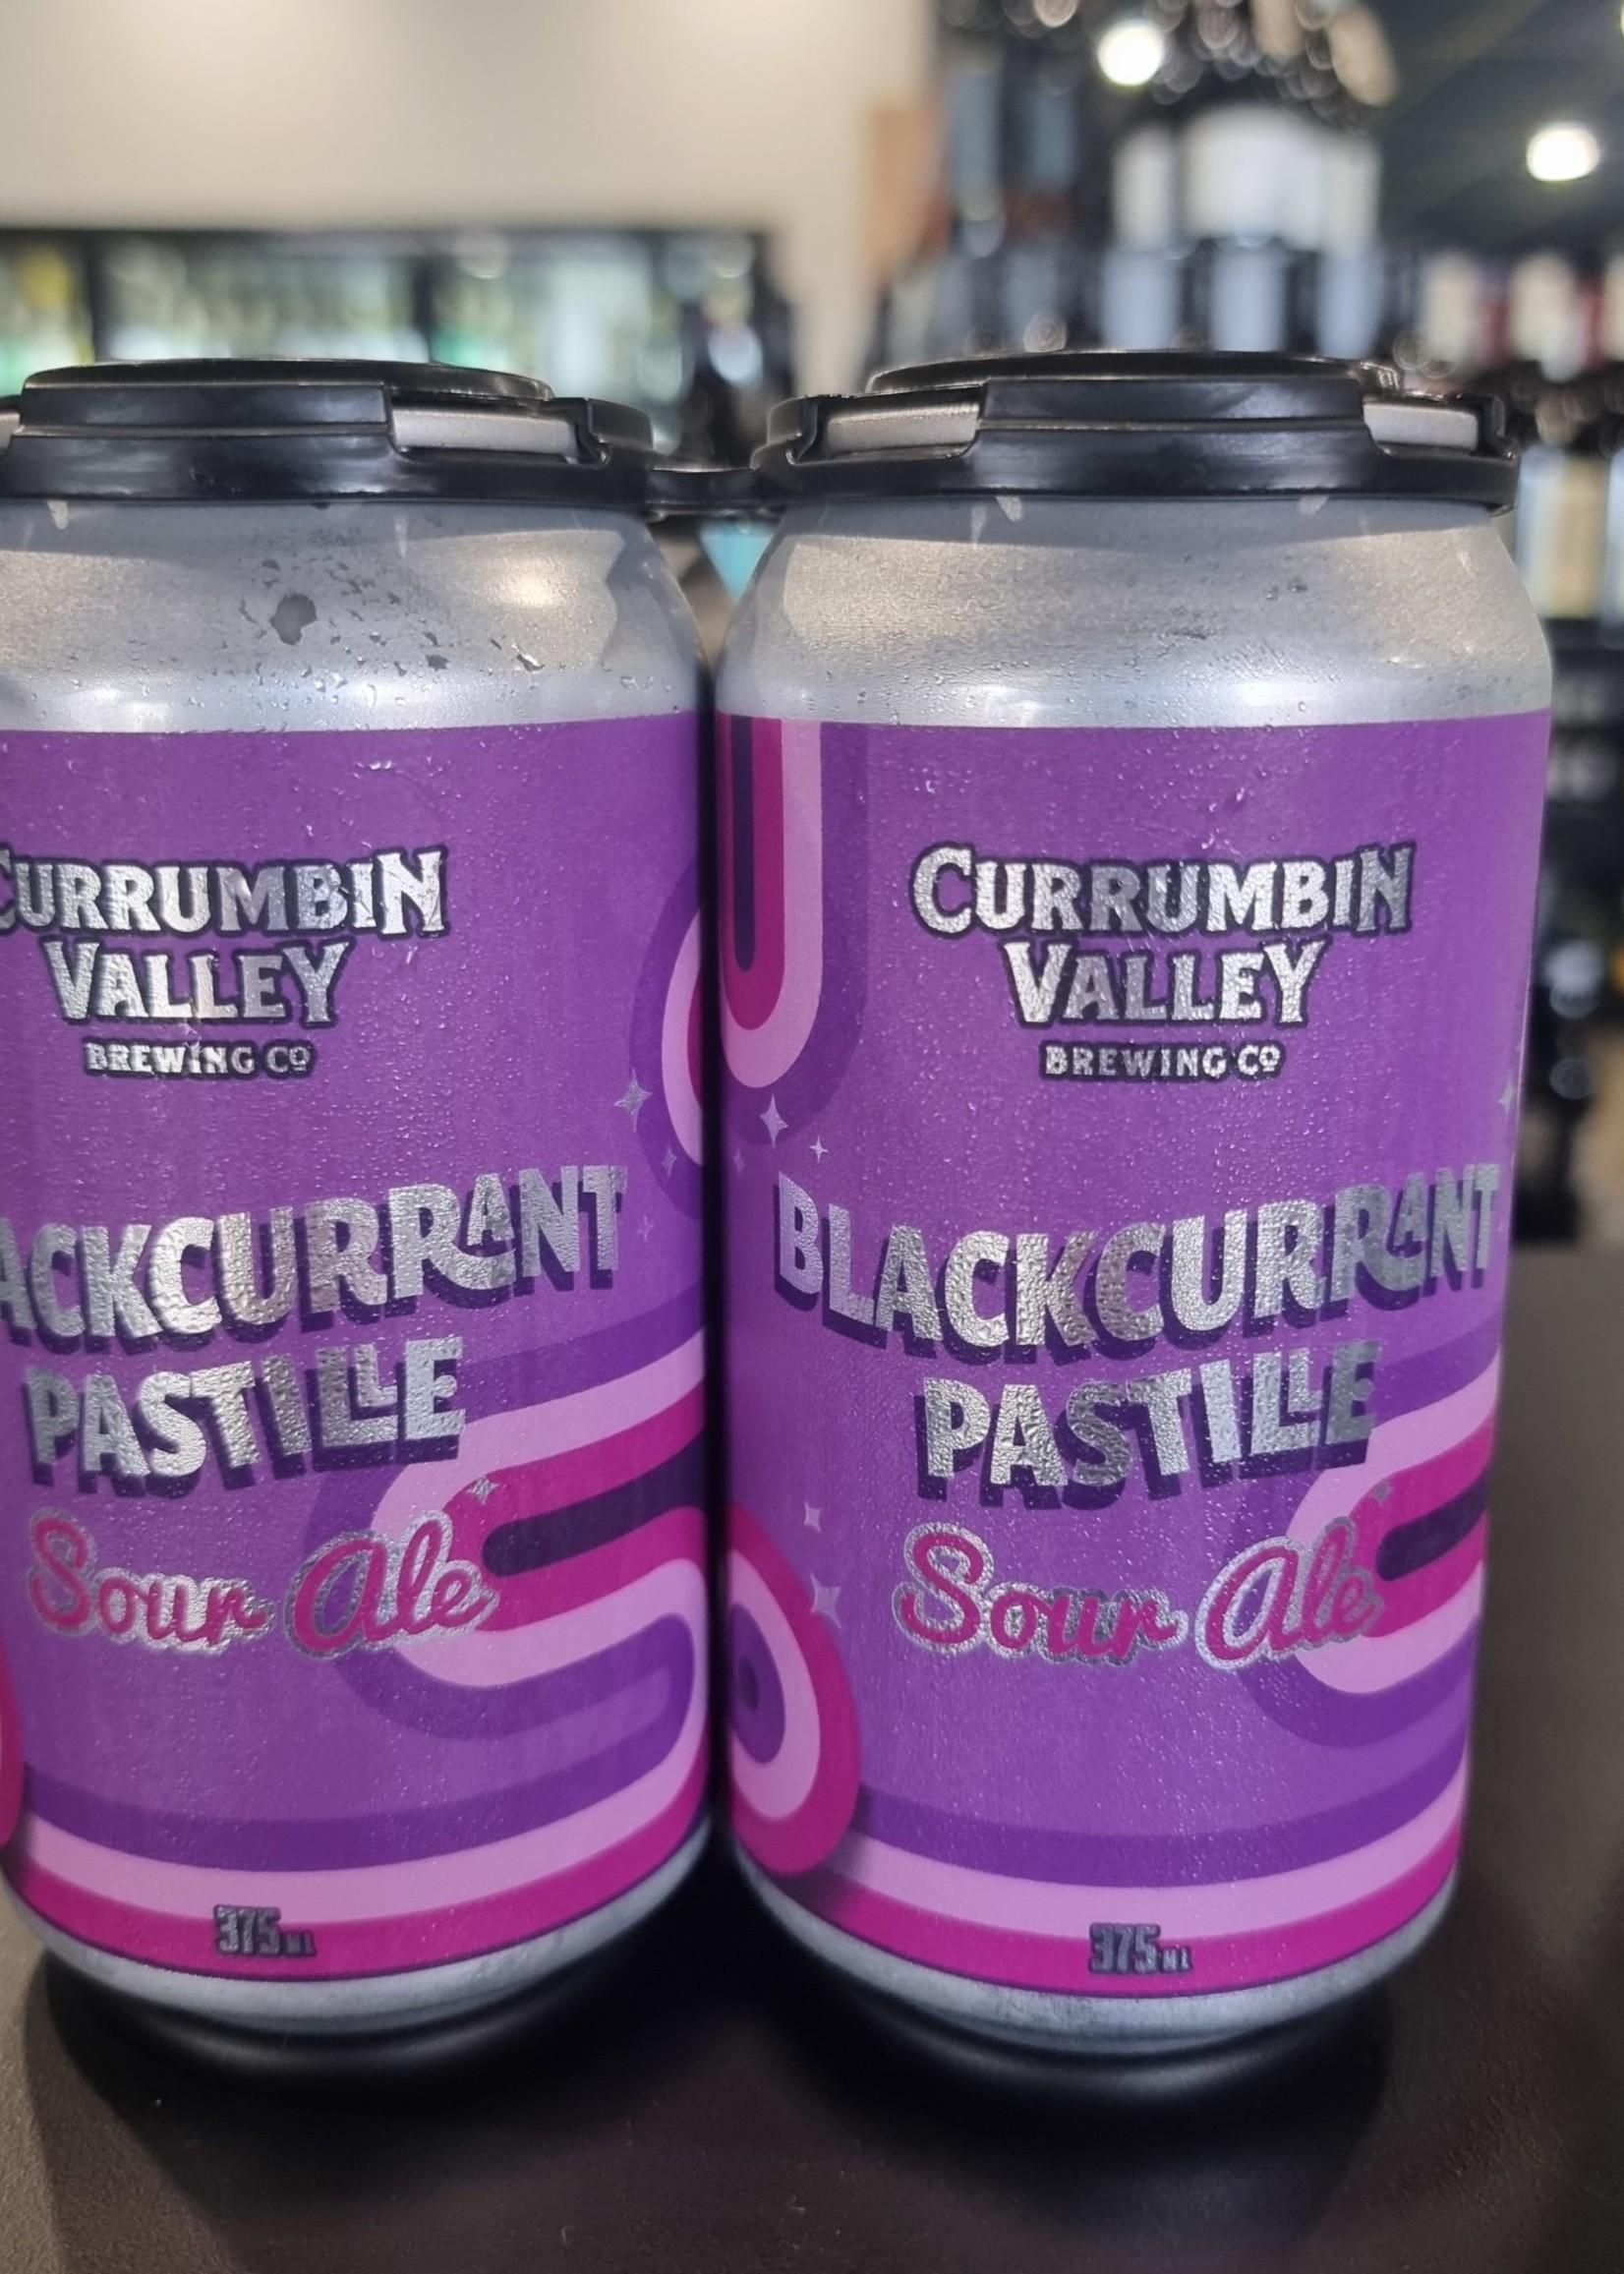 Currumbin Valley Currumbin Valley 'Blackcurrant Pastile' Sour Ale single